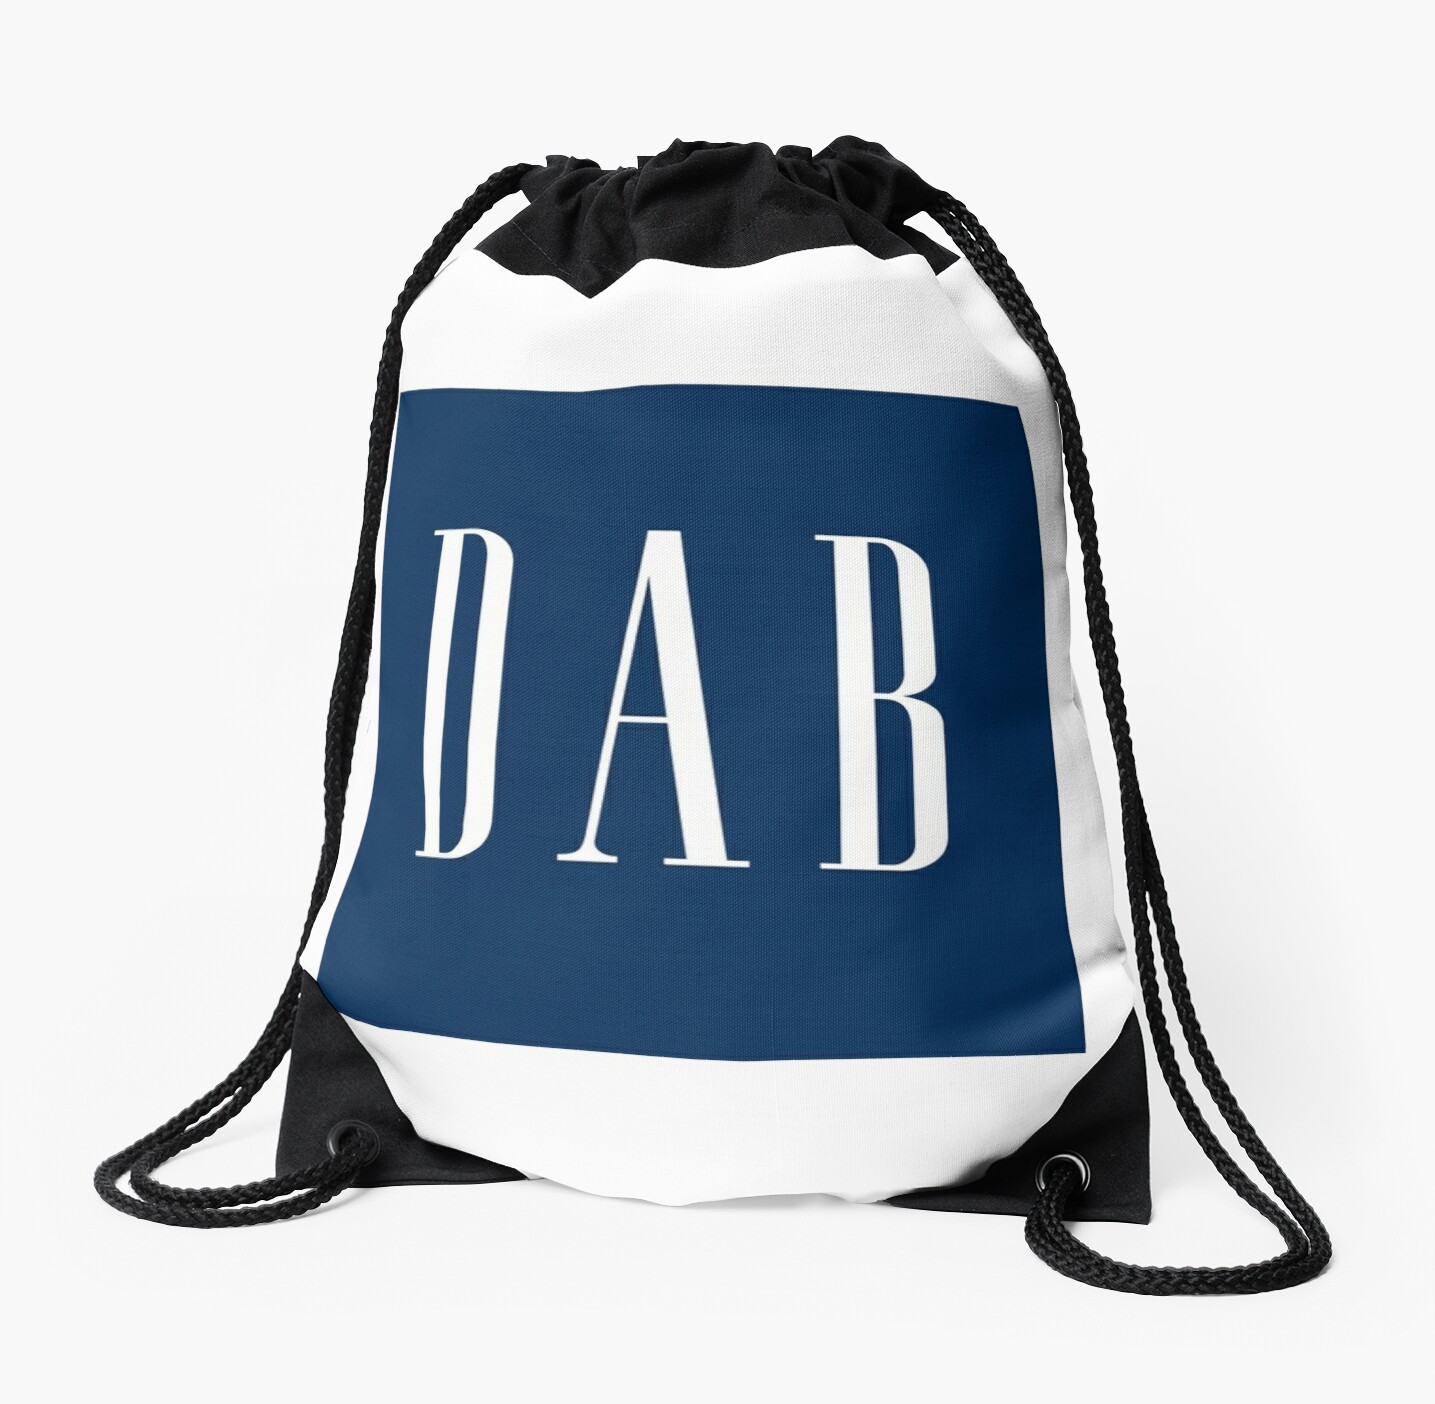 Dab Gap Logo